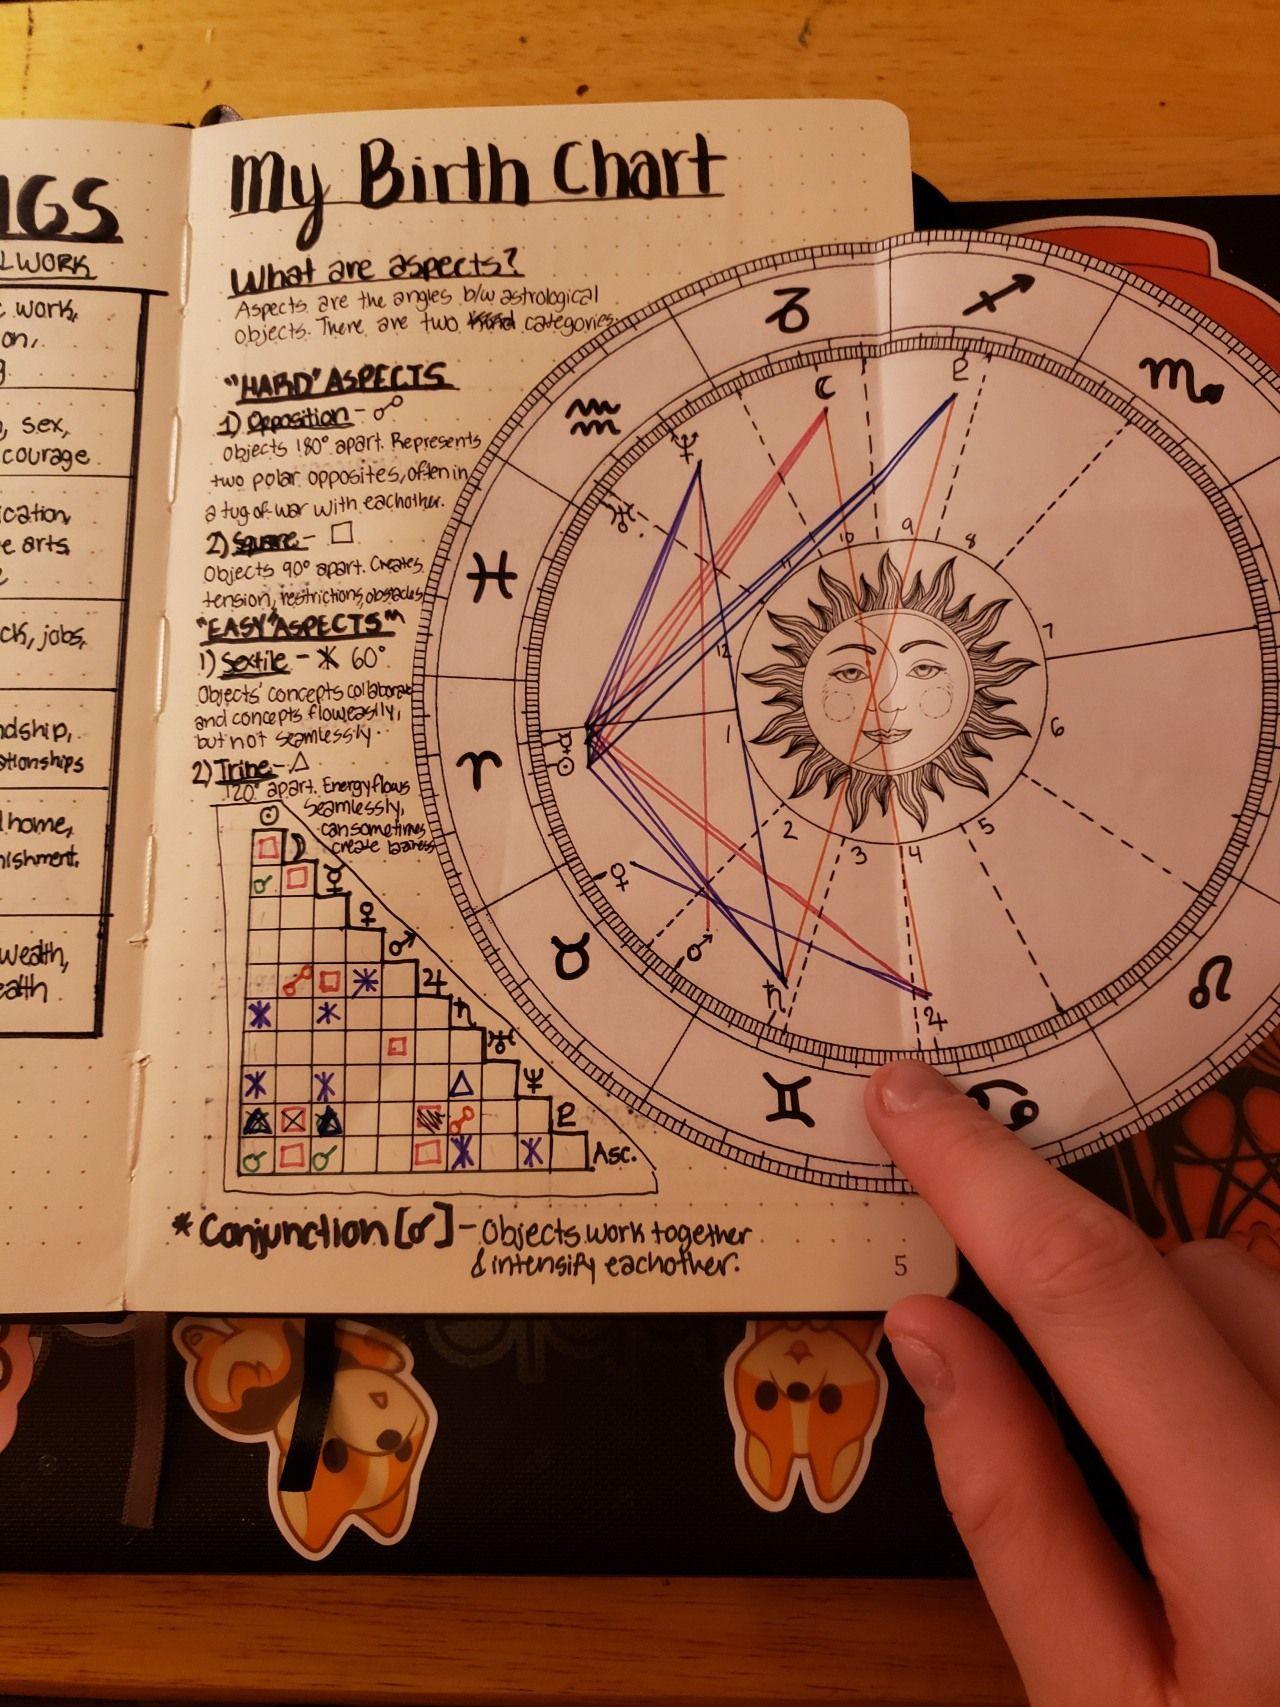 Carnet de Sorcellerie